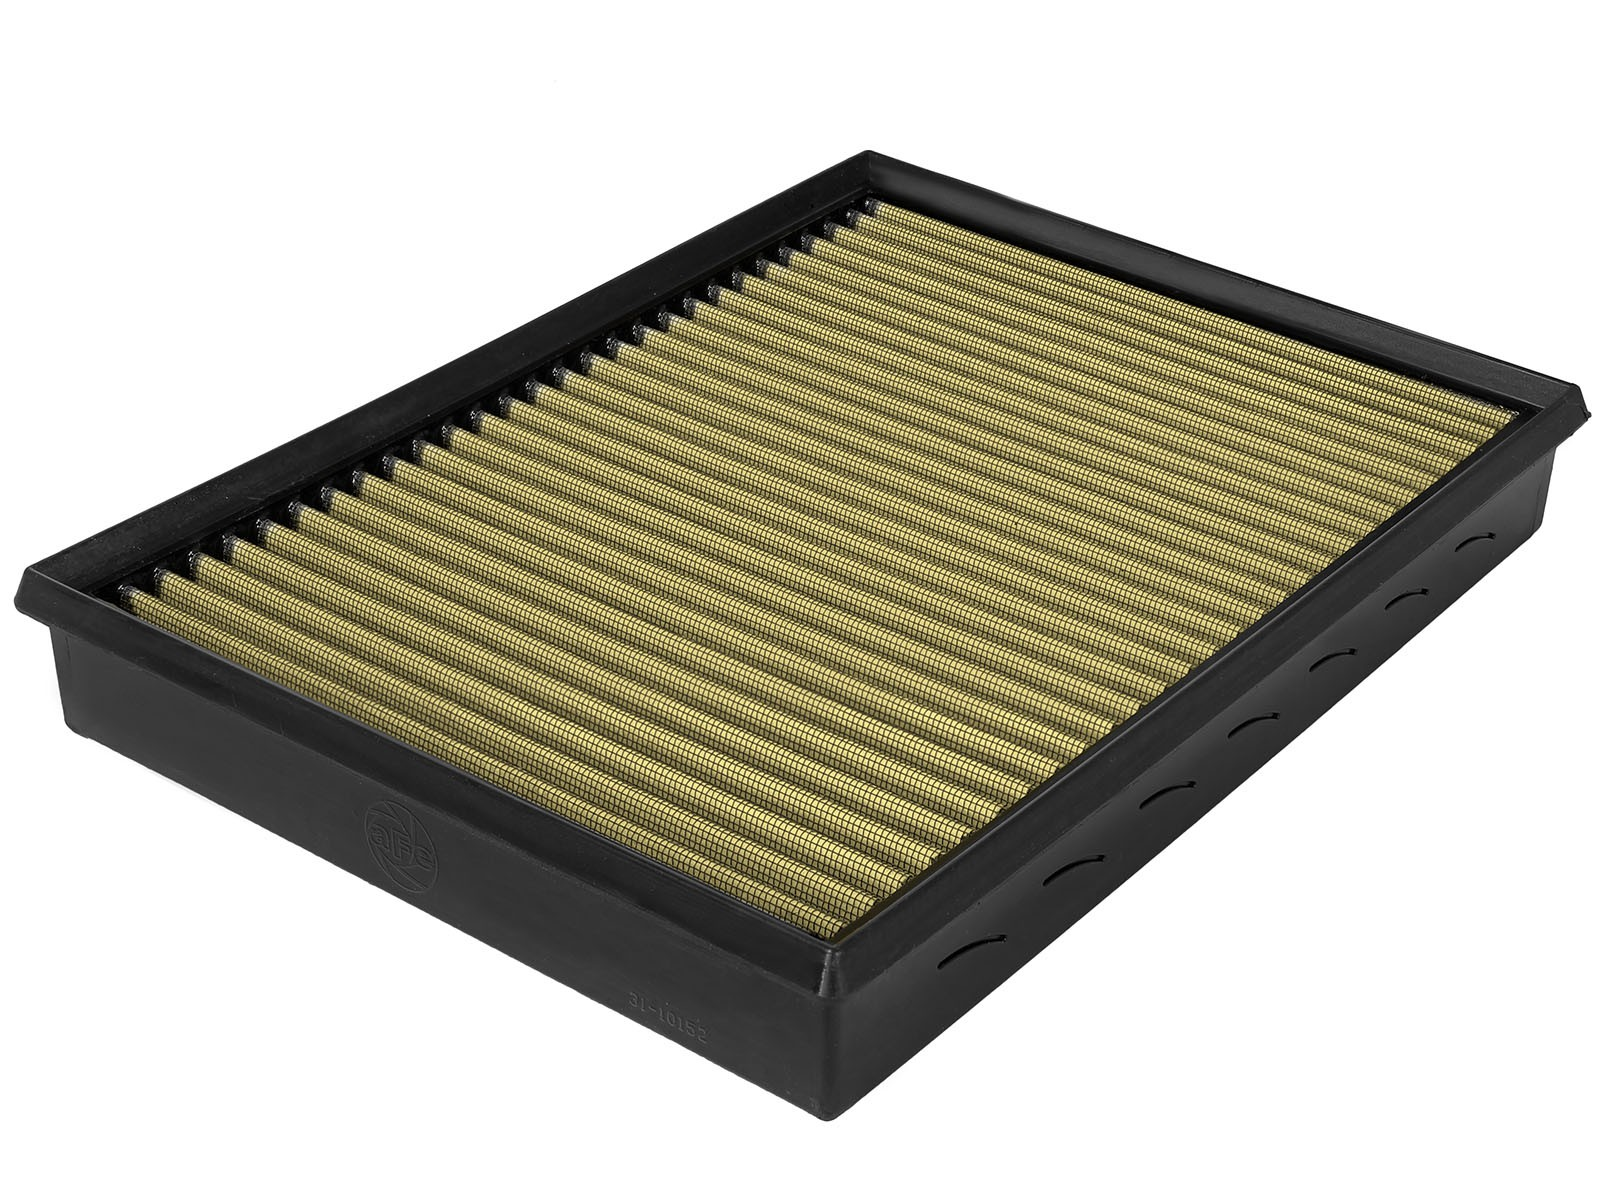 aFe POWER 73-10152 Magnum FLOW Pro GUARD7 Air Filter